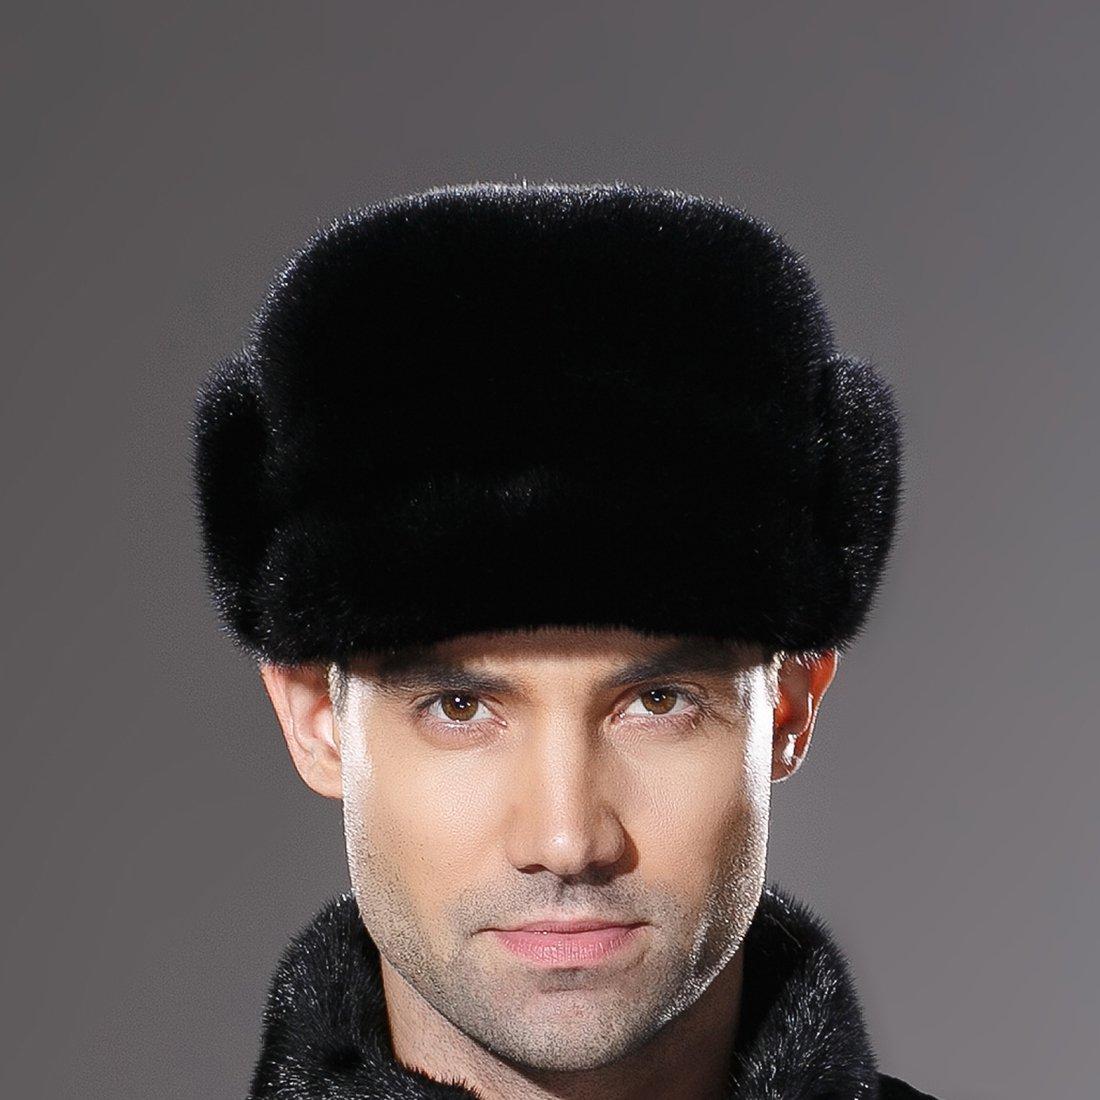 URSFUR Mne's Winter Fur Cap Genuine Mink Fur Fudd Hat Black M by URSFUR (Image #2)